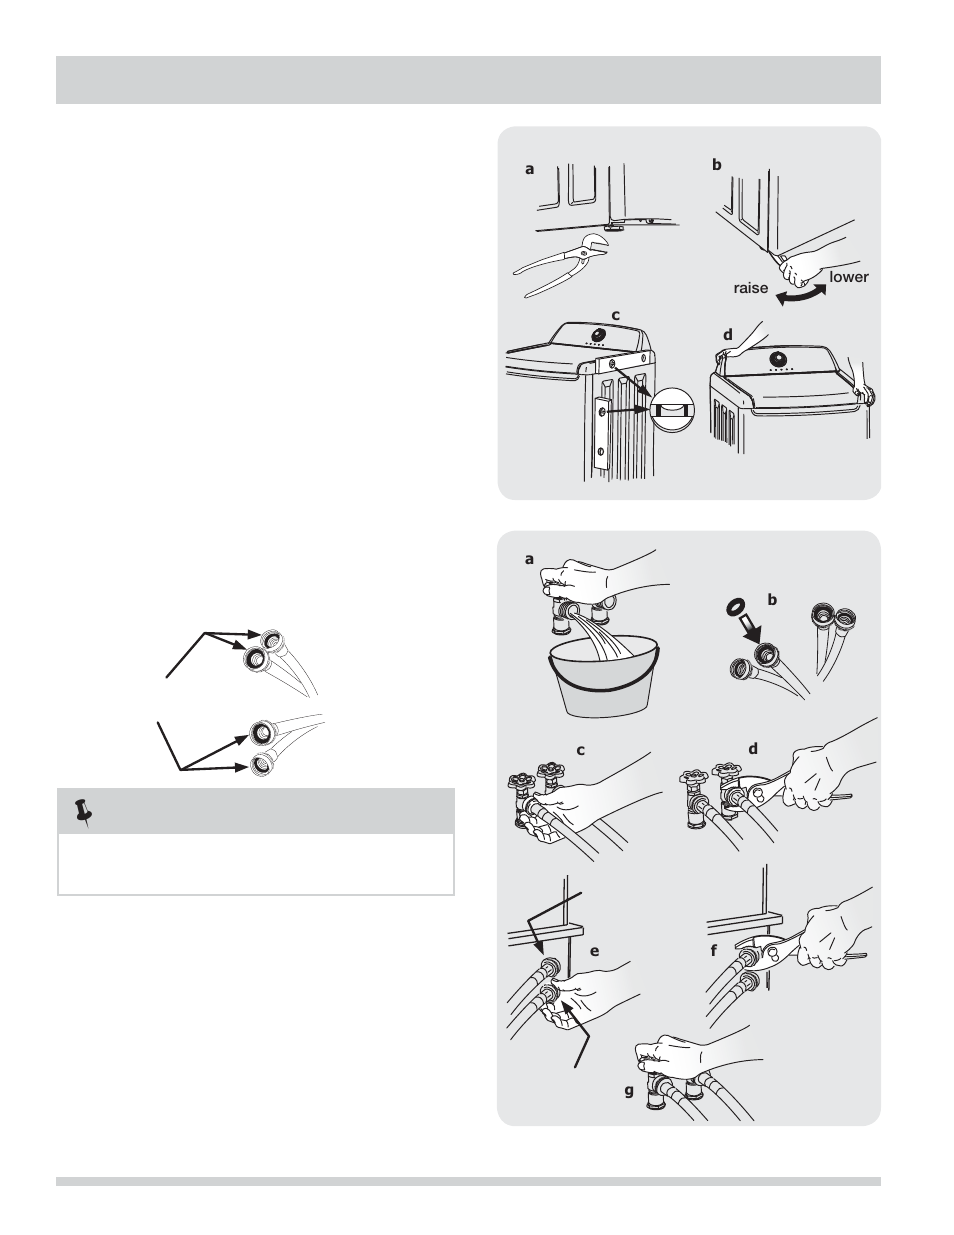 installation instructions frigidaire affinity washer fahe1011mw rh manualsdir com frigidaire affinity washer owners manual frigidaire affinity washer user manual